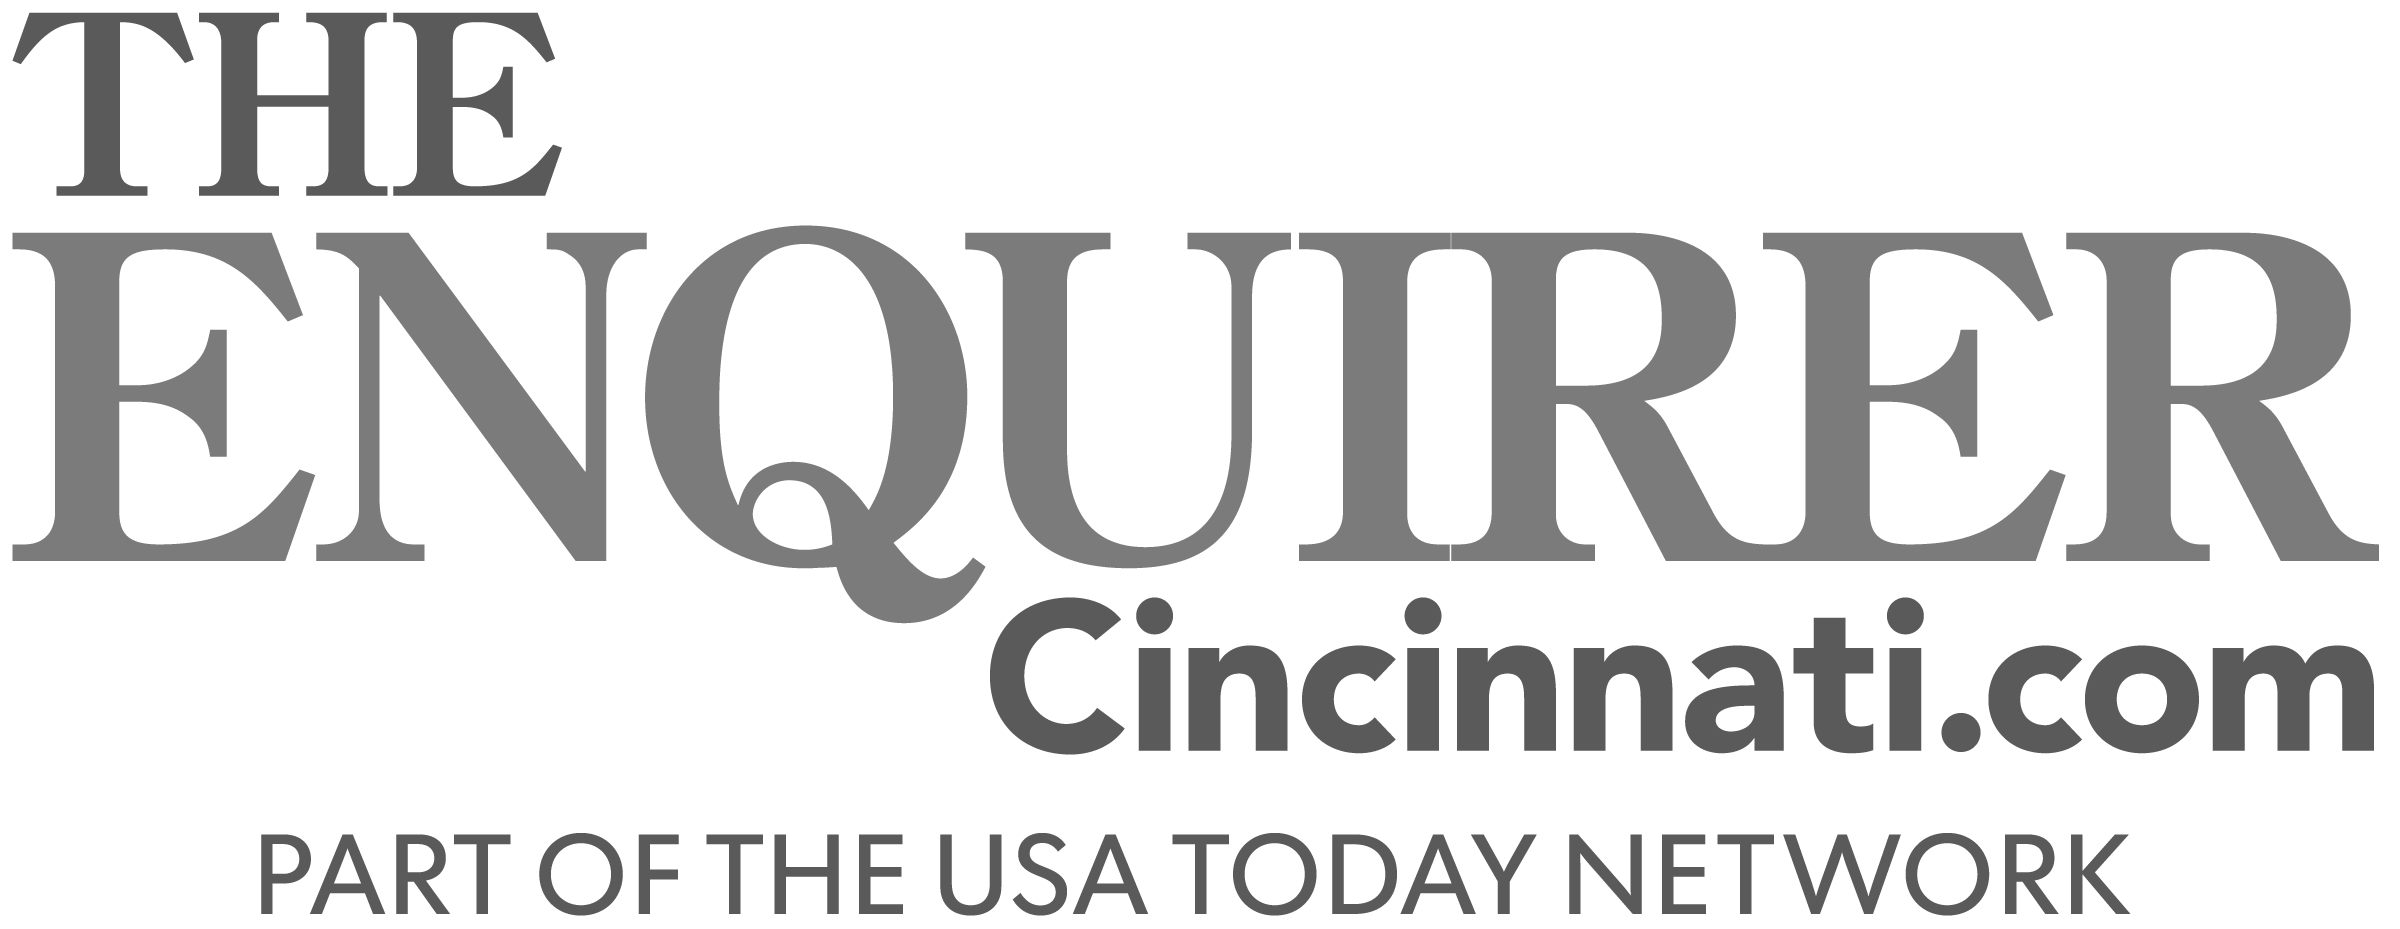 Cincinnati-Enquirer.png